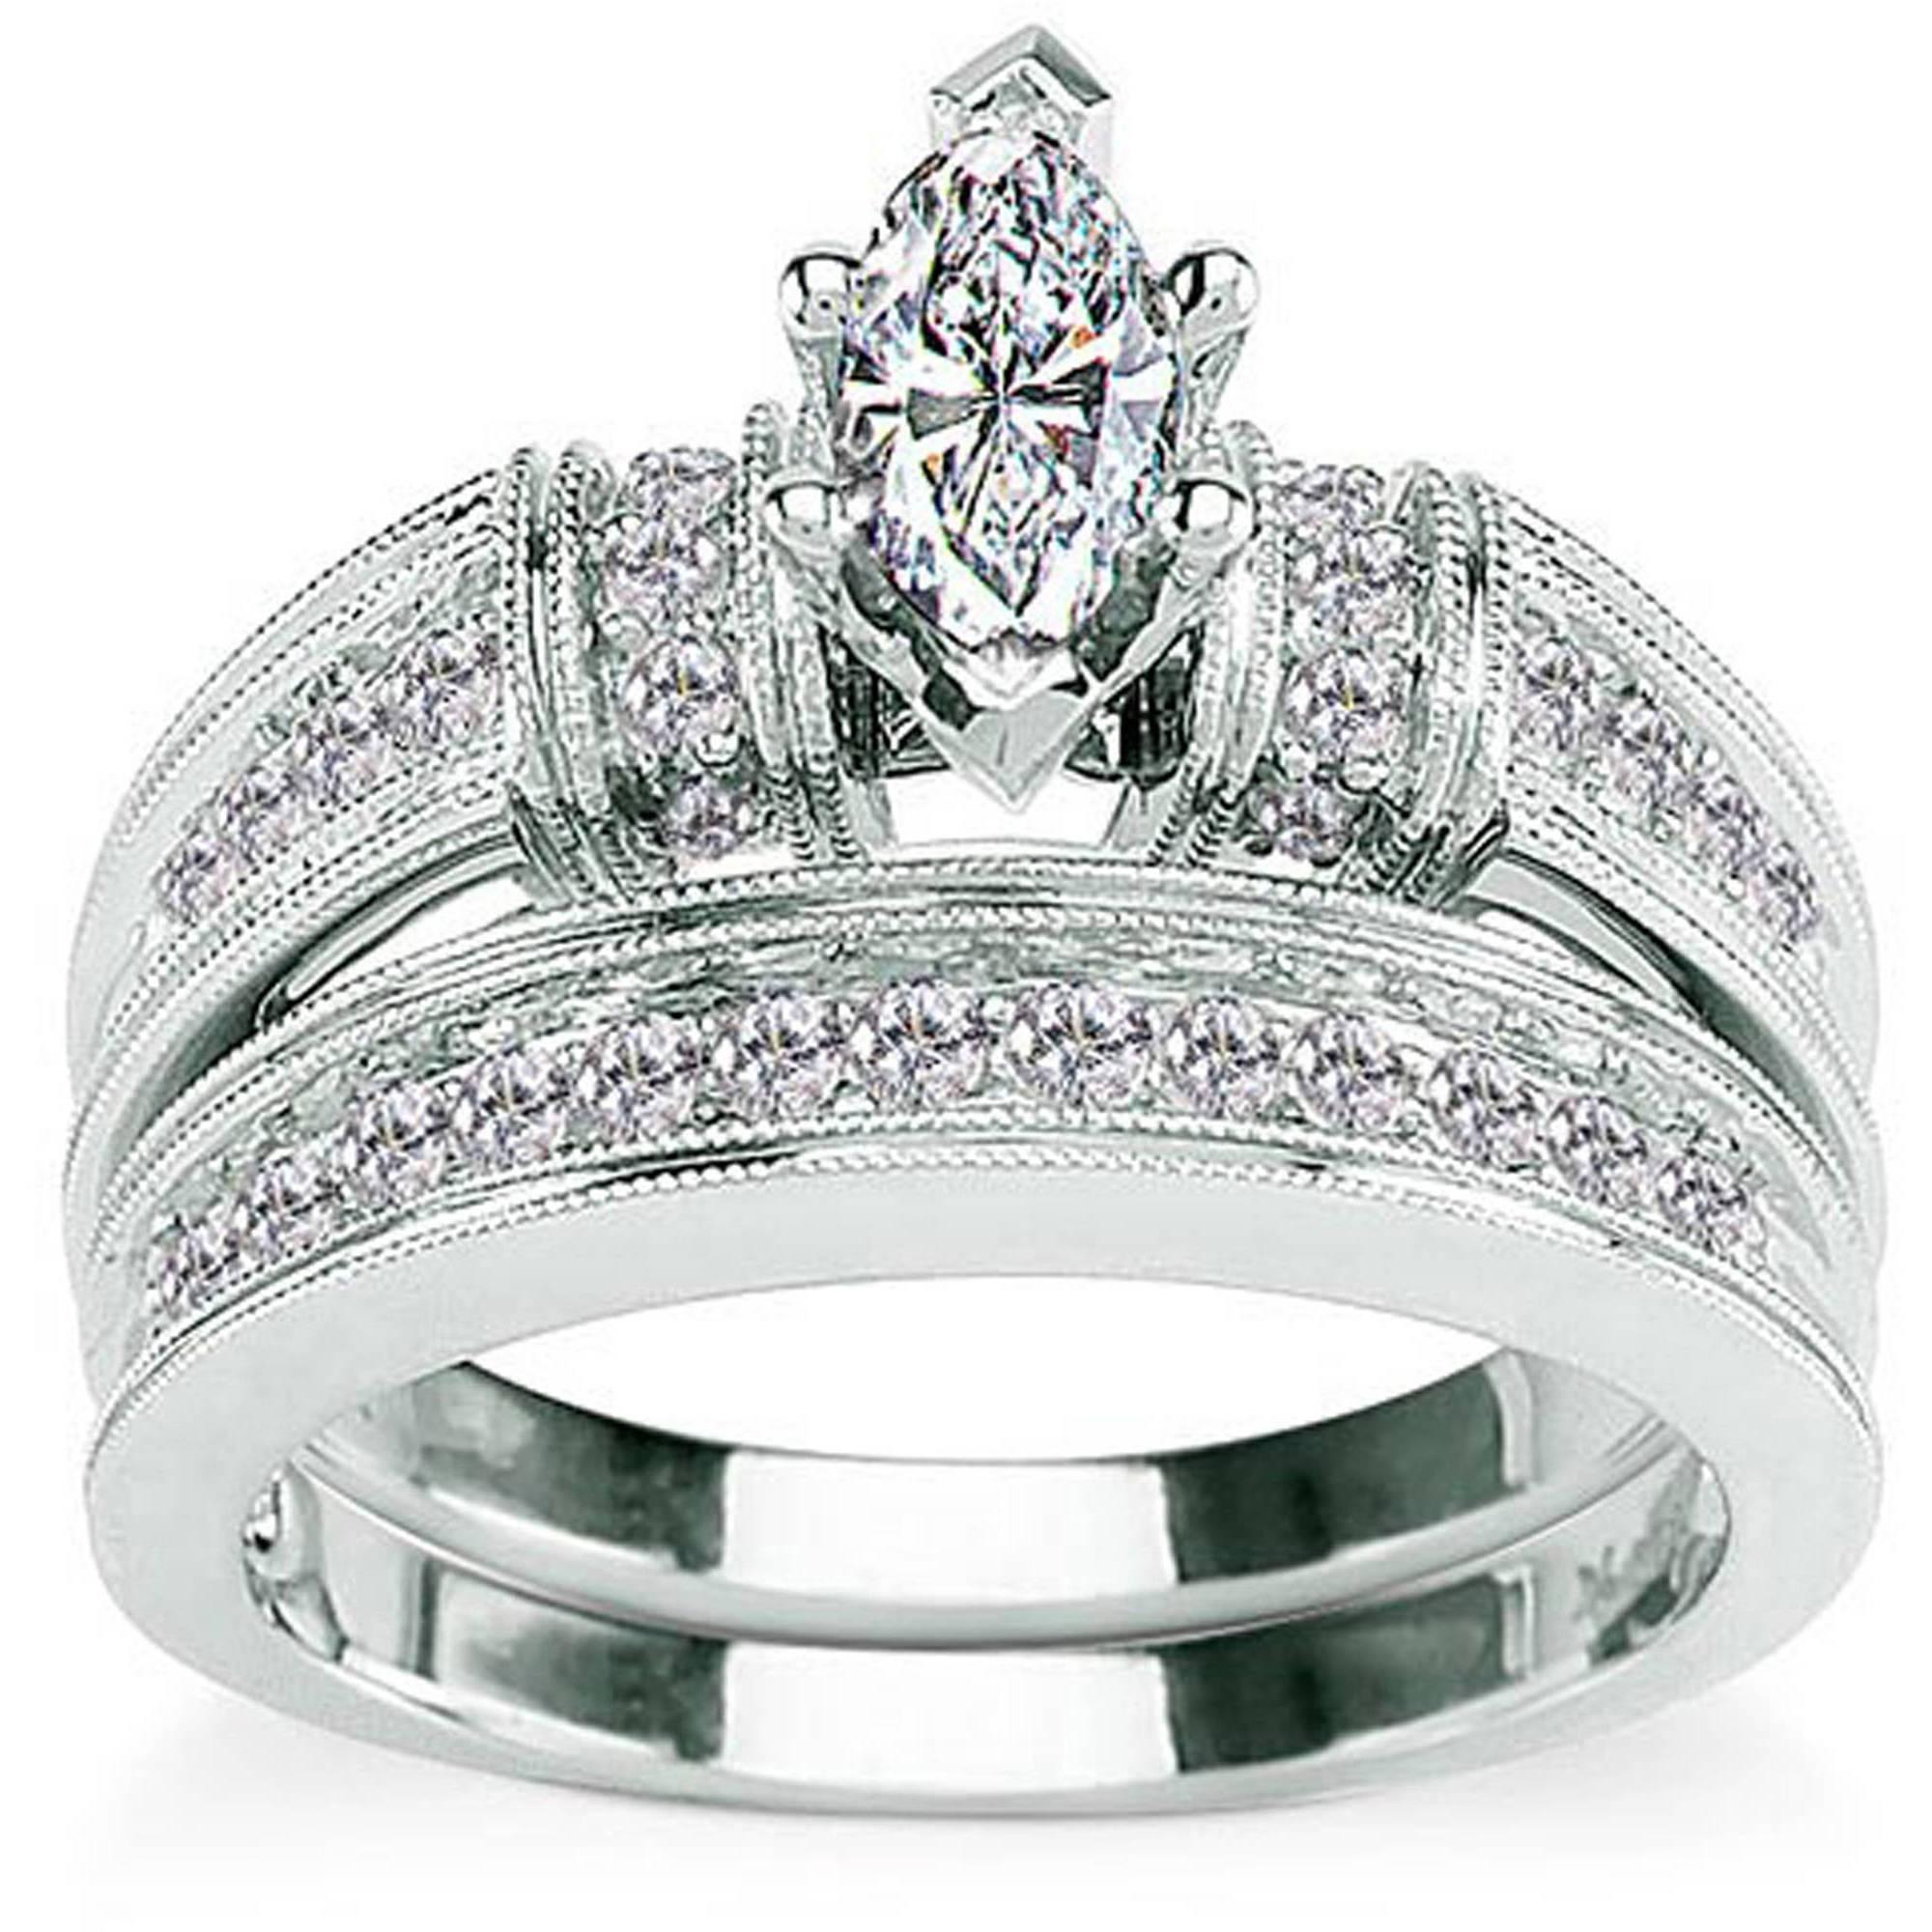 3.3 Carat T.g.w. Cz 14Kt Gold Plated Wedding Ring Set – Walmart In Walmart Womens Wedding Bands (Gallery 11 of 15)